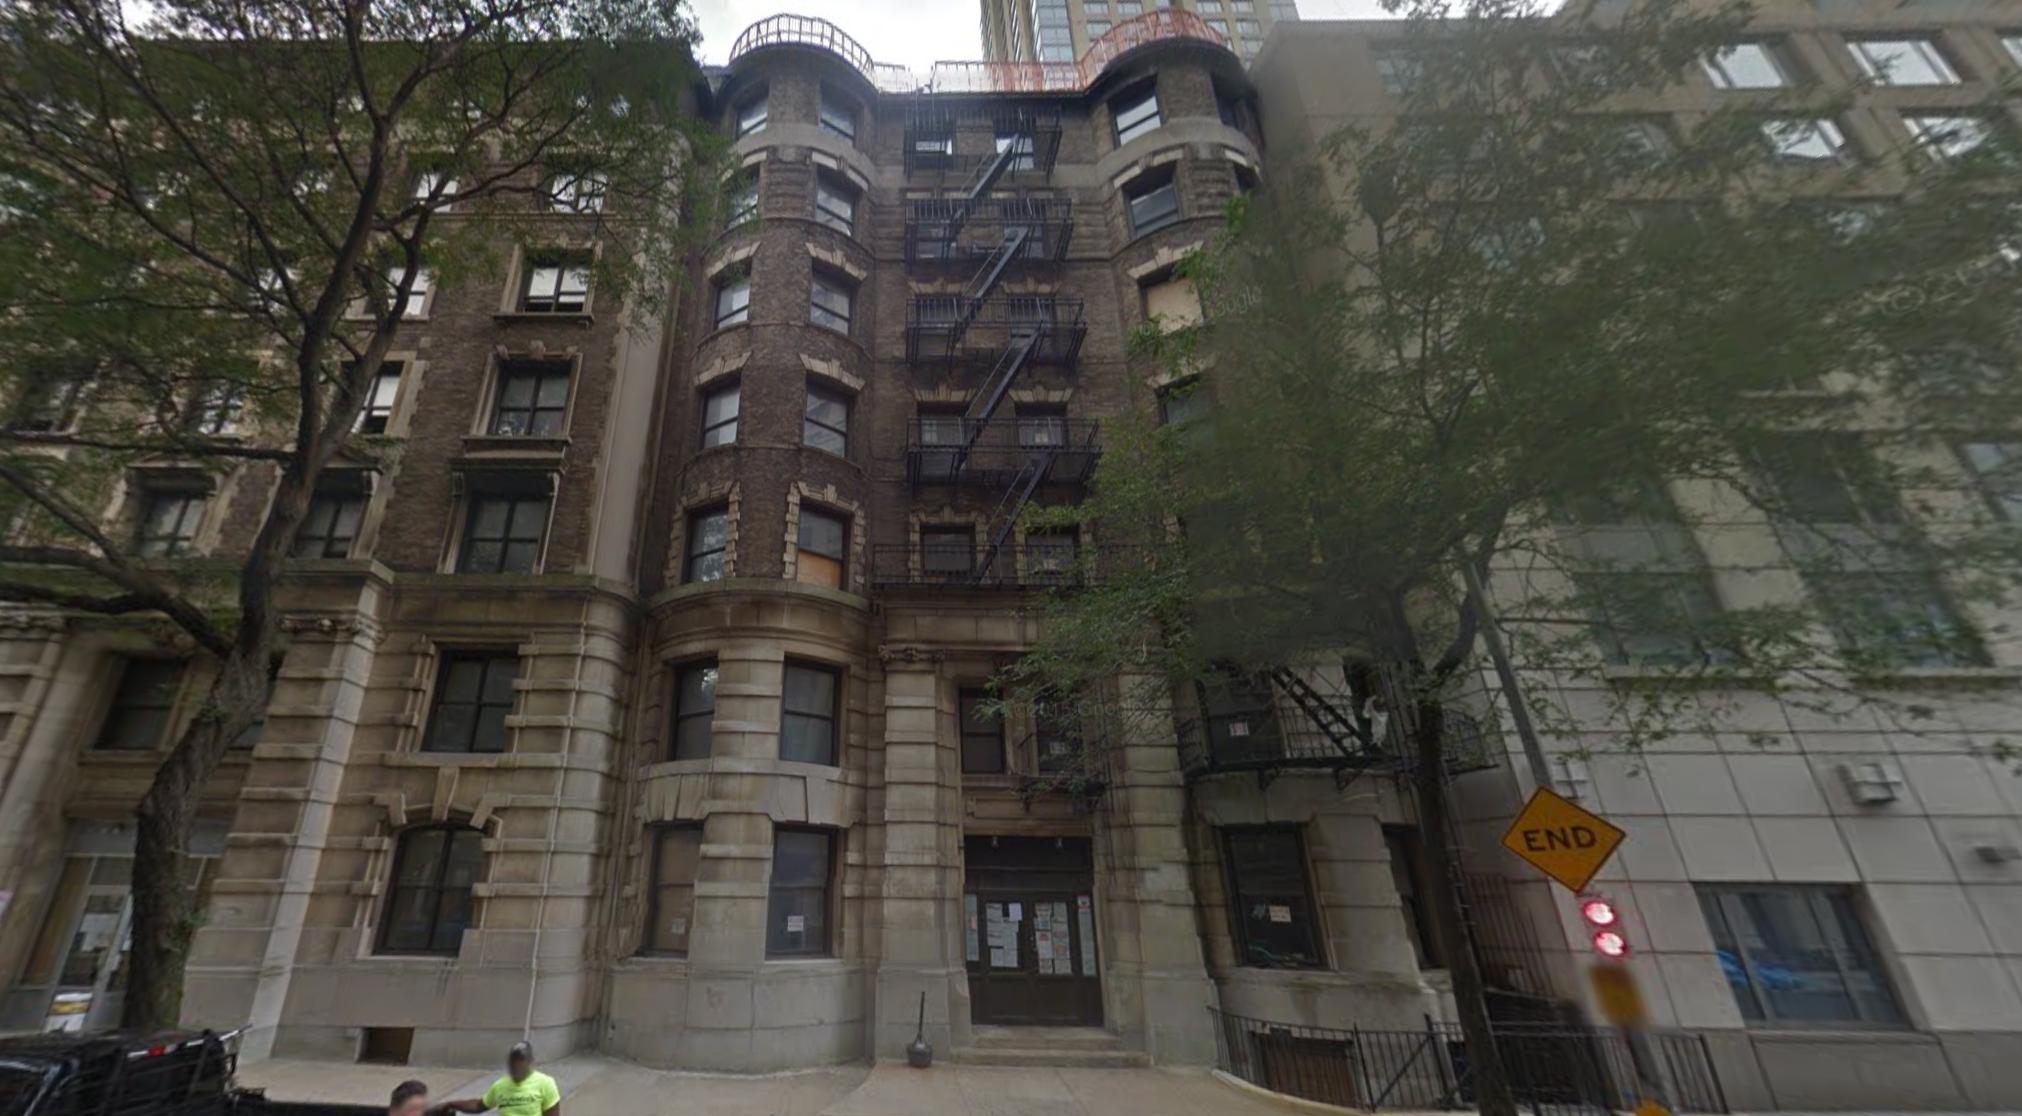 346-350 West 71st Street, image via Google Maps